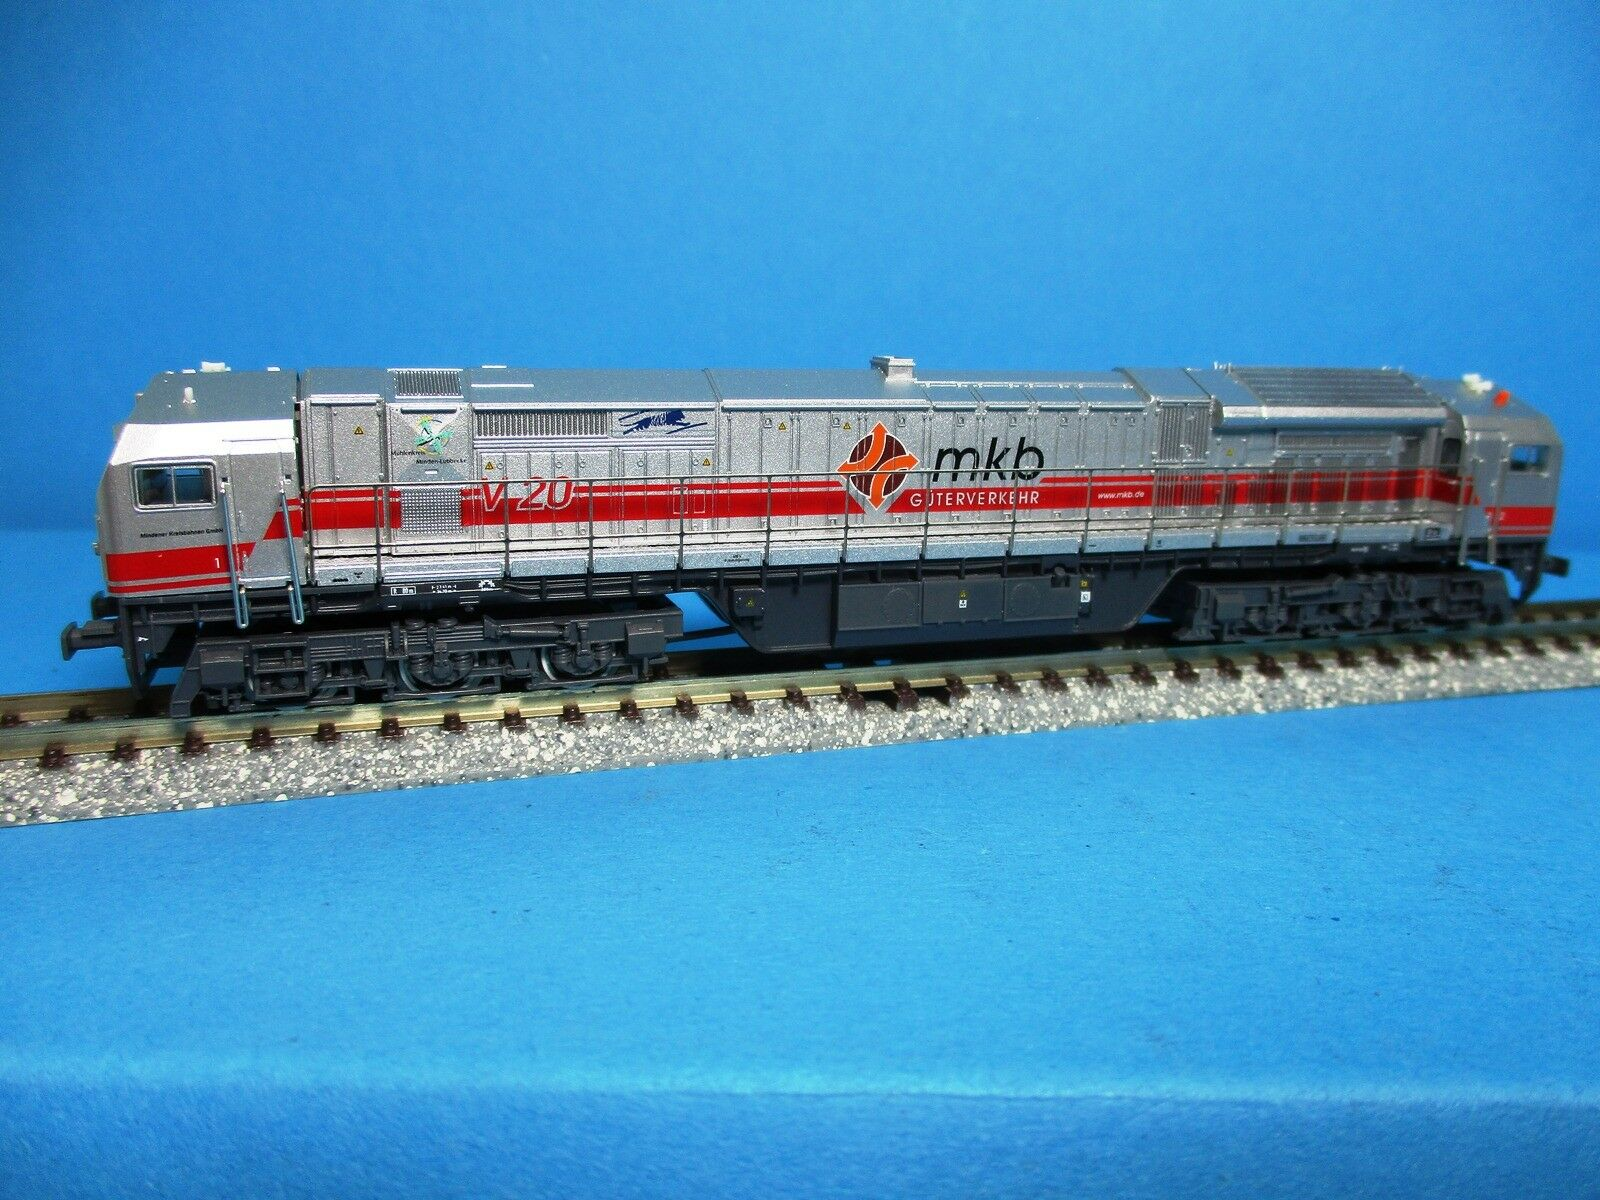 Mehano T512 Diesellokomotive V 330 bluee Tiger mkb,analog,OVP,M 1  160